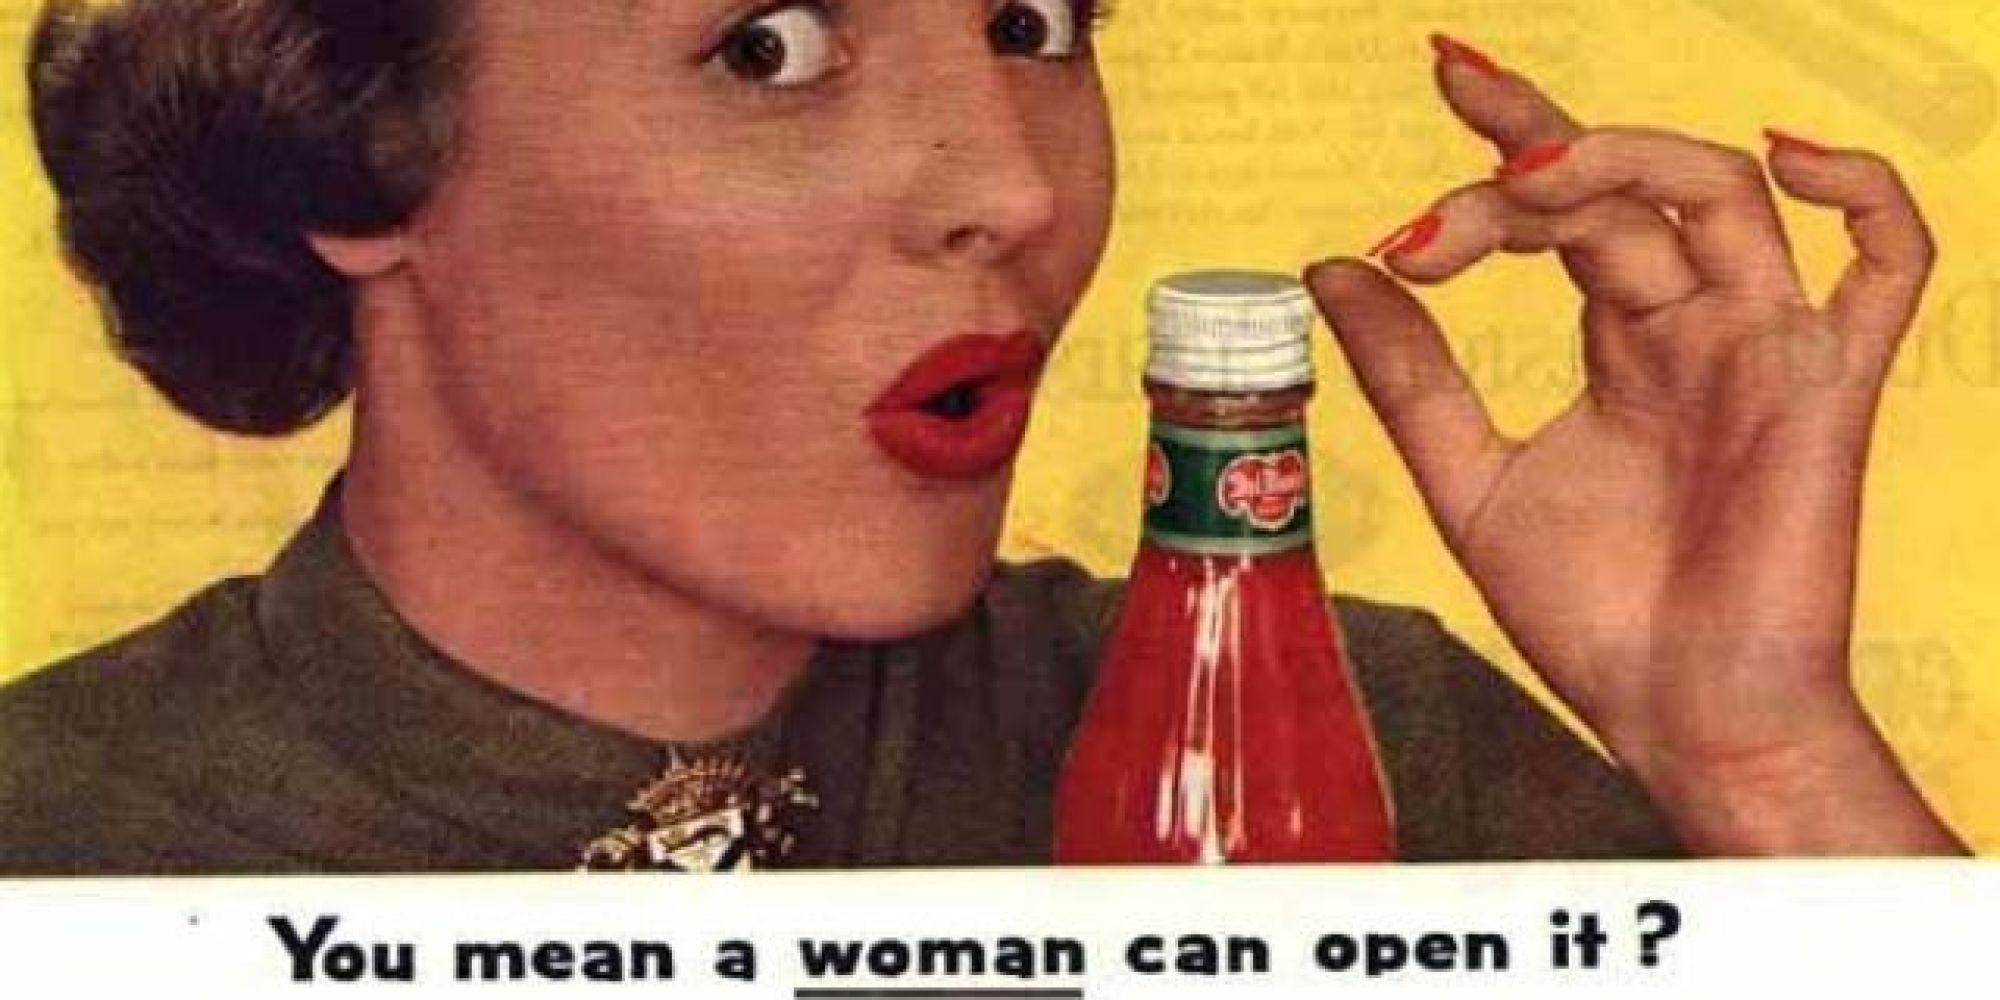 Sexism Advertisements 119